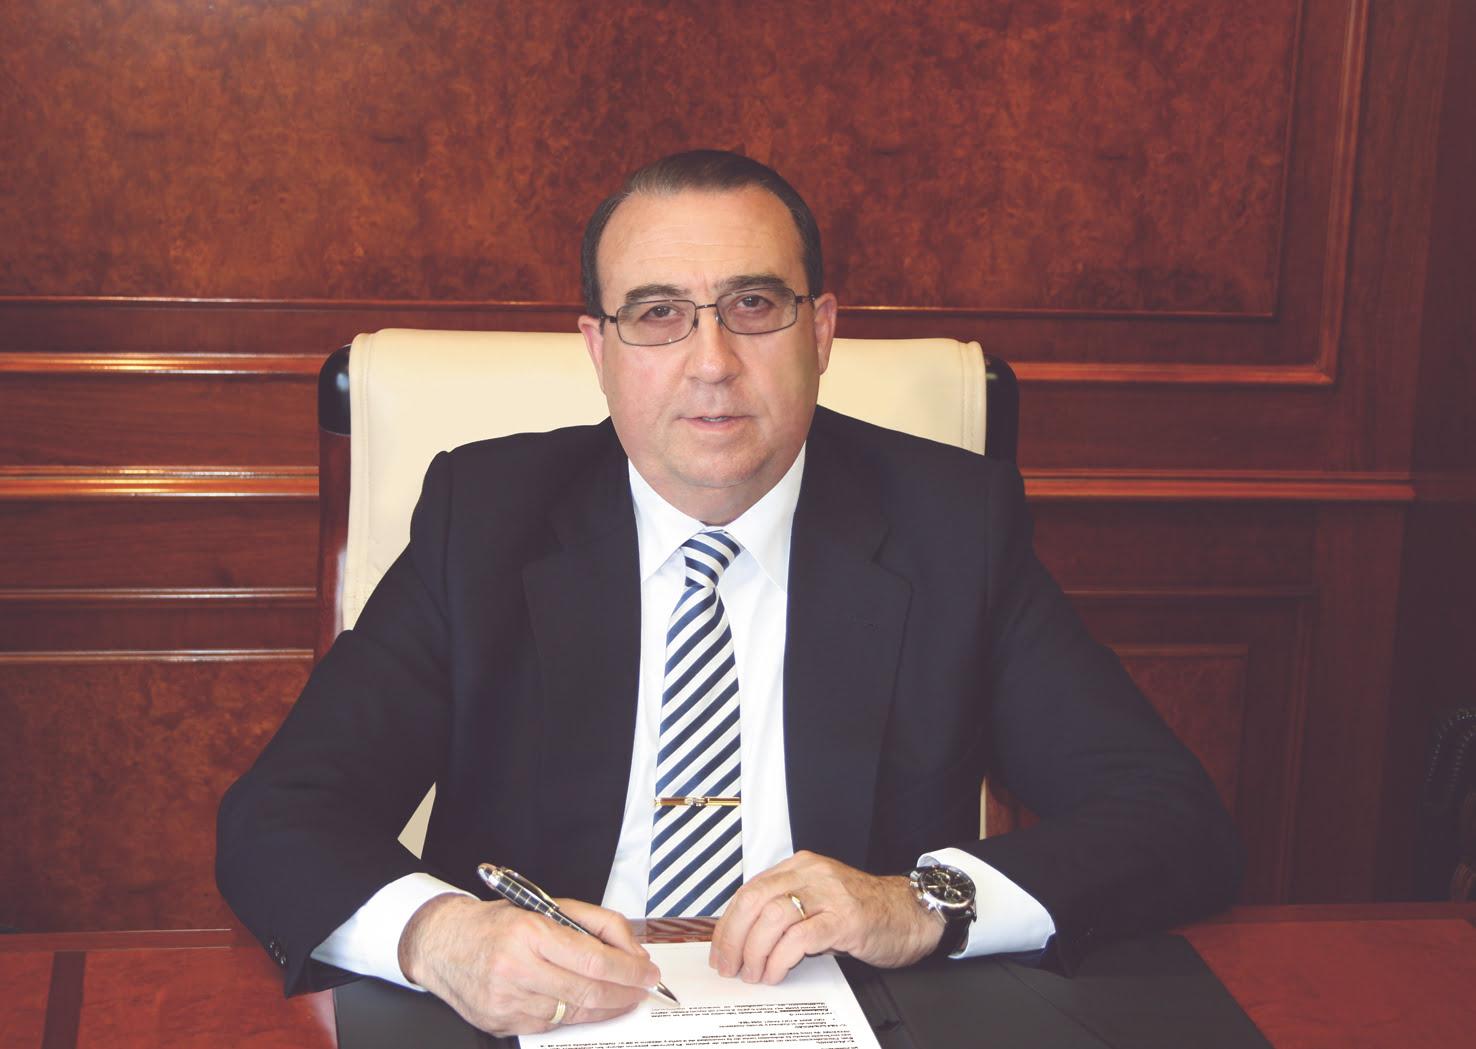 Sr. José Luis José Chafer